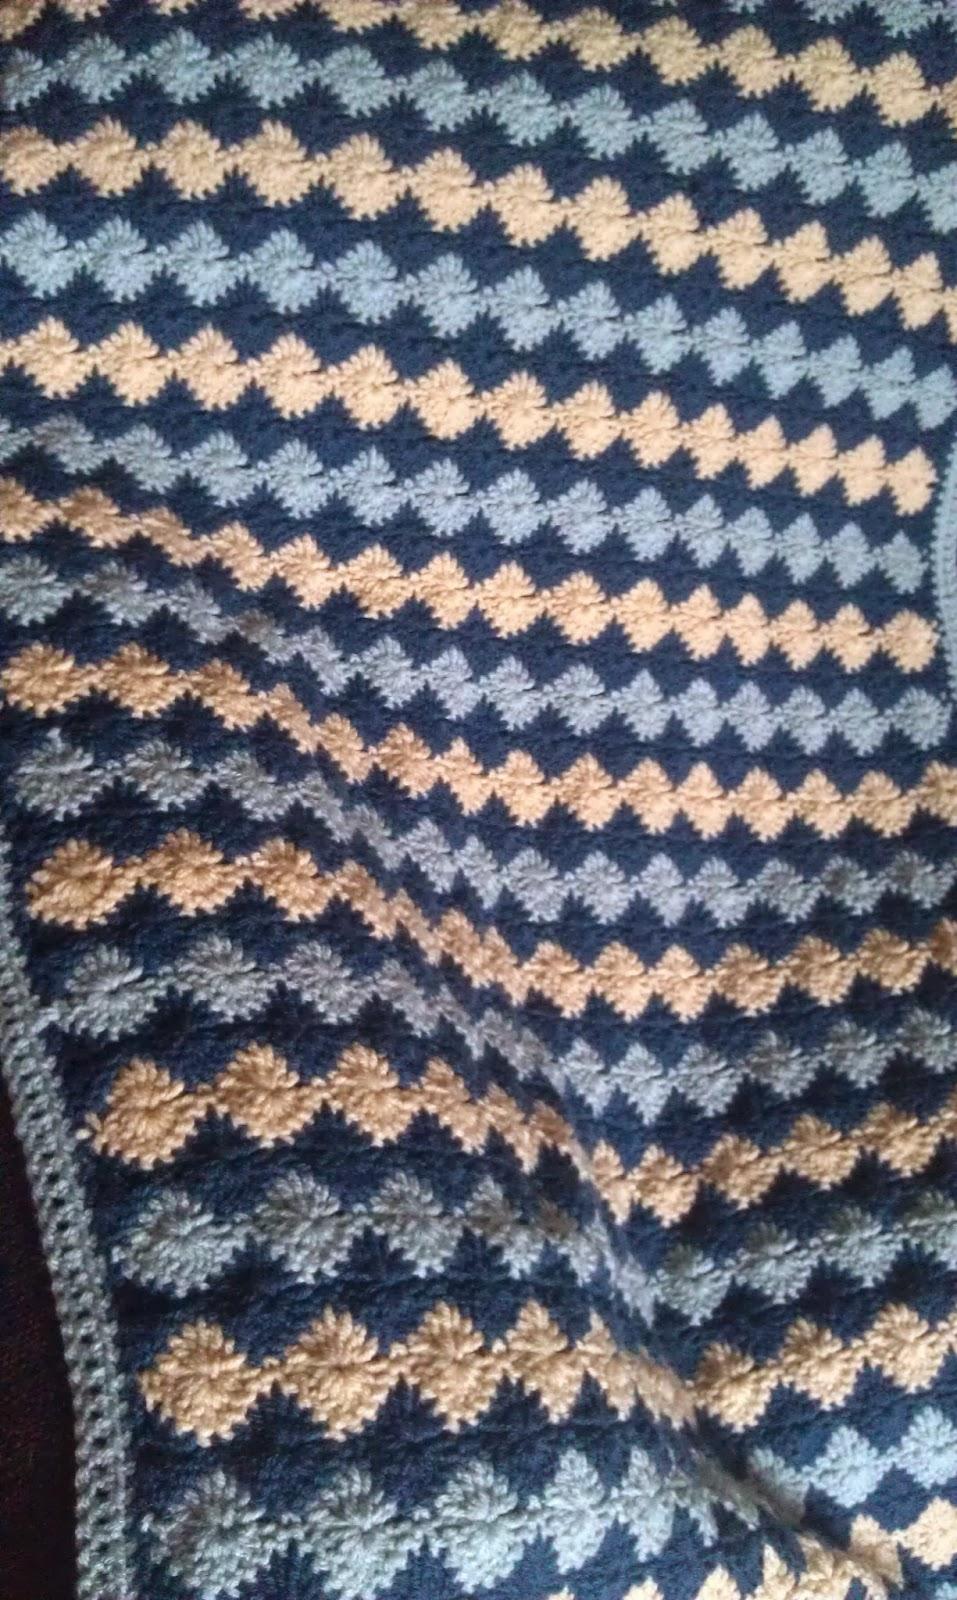 Crochet Stitches Catherine Wheel : Missed Stitches Crochet: Catherine Wheel Stitch Crochet Afghan plus ...